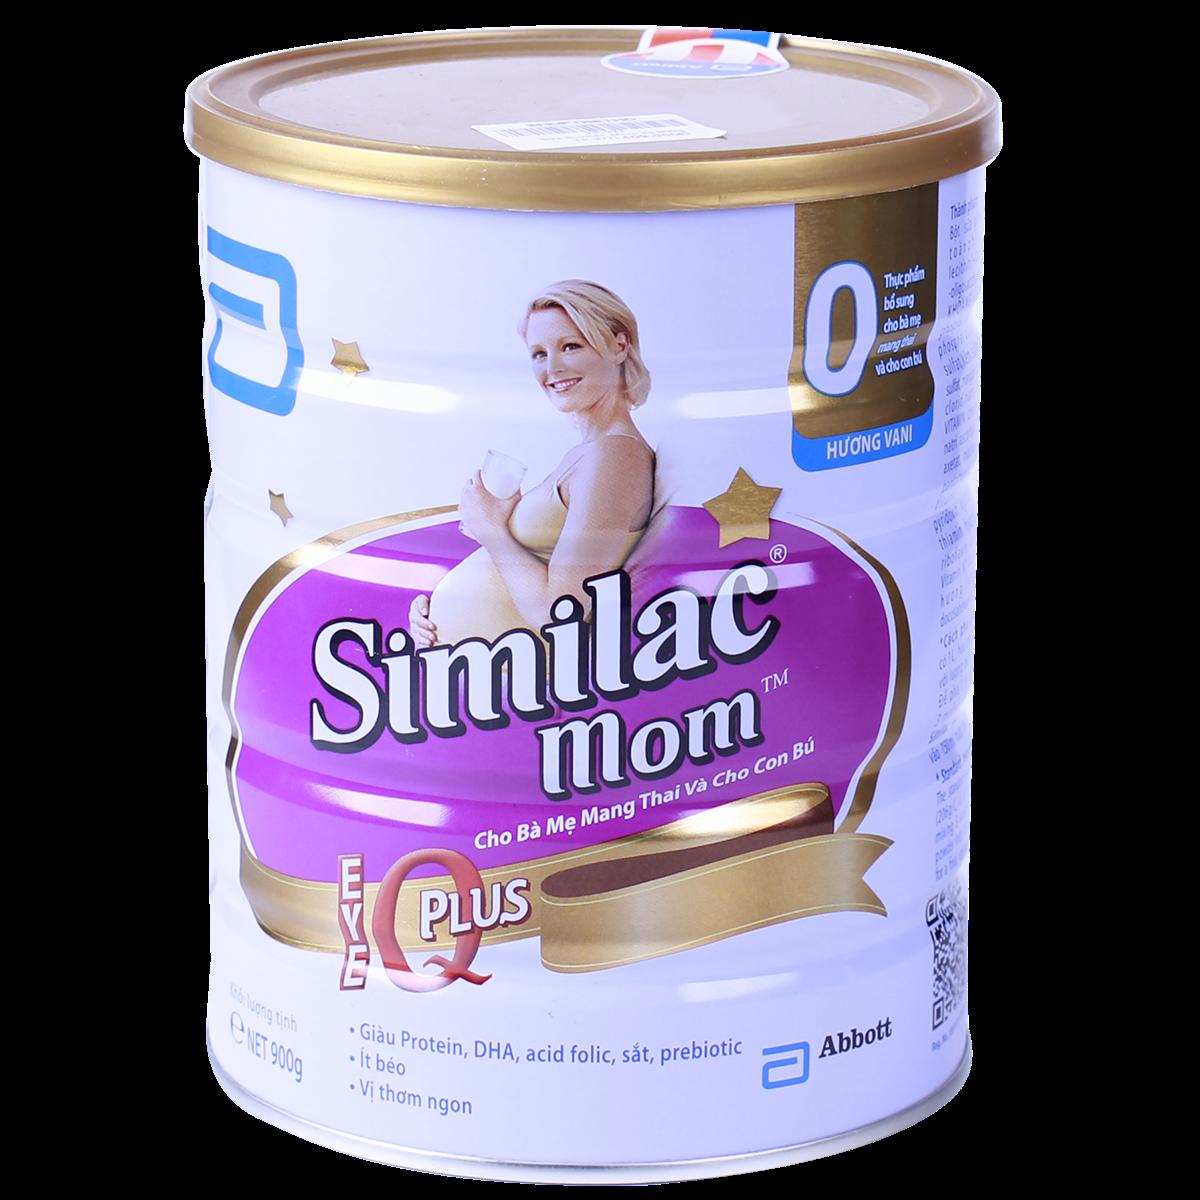 Sữa Similac Mom IQ - 900g